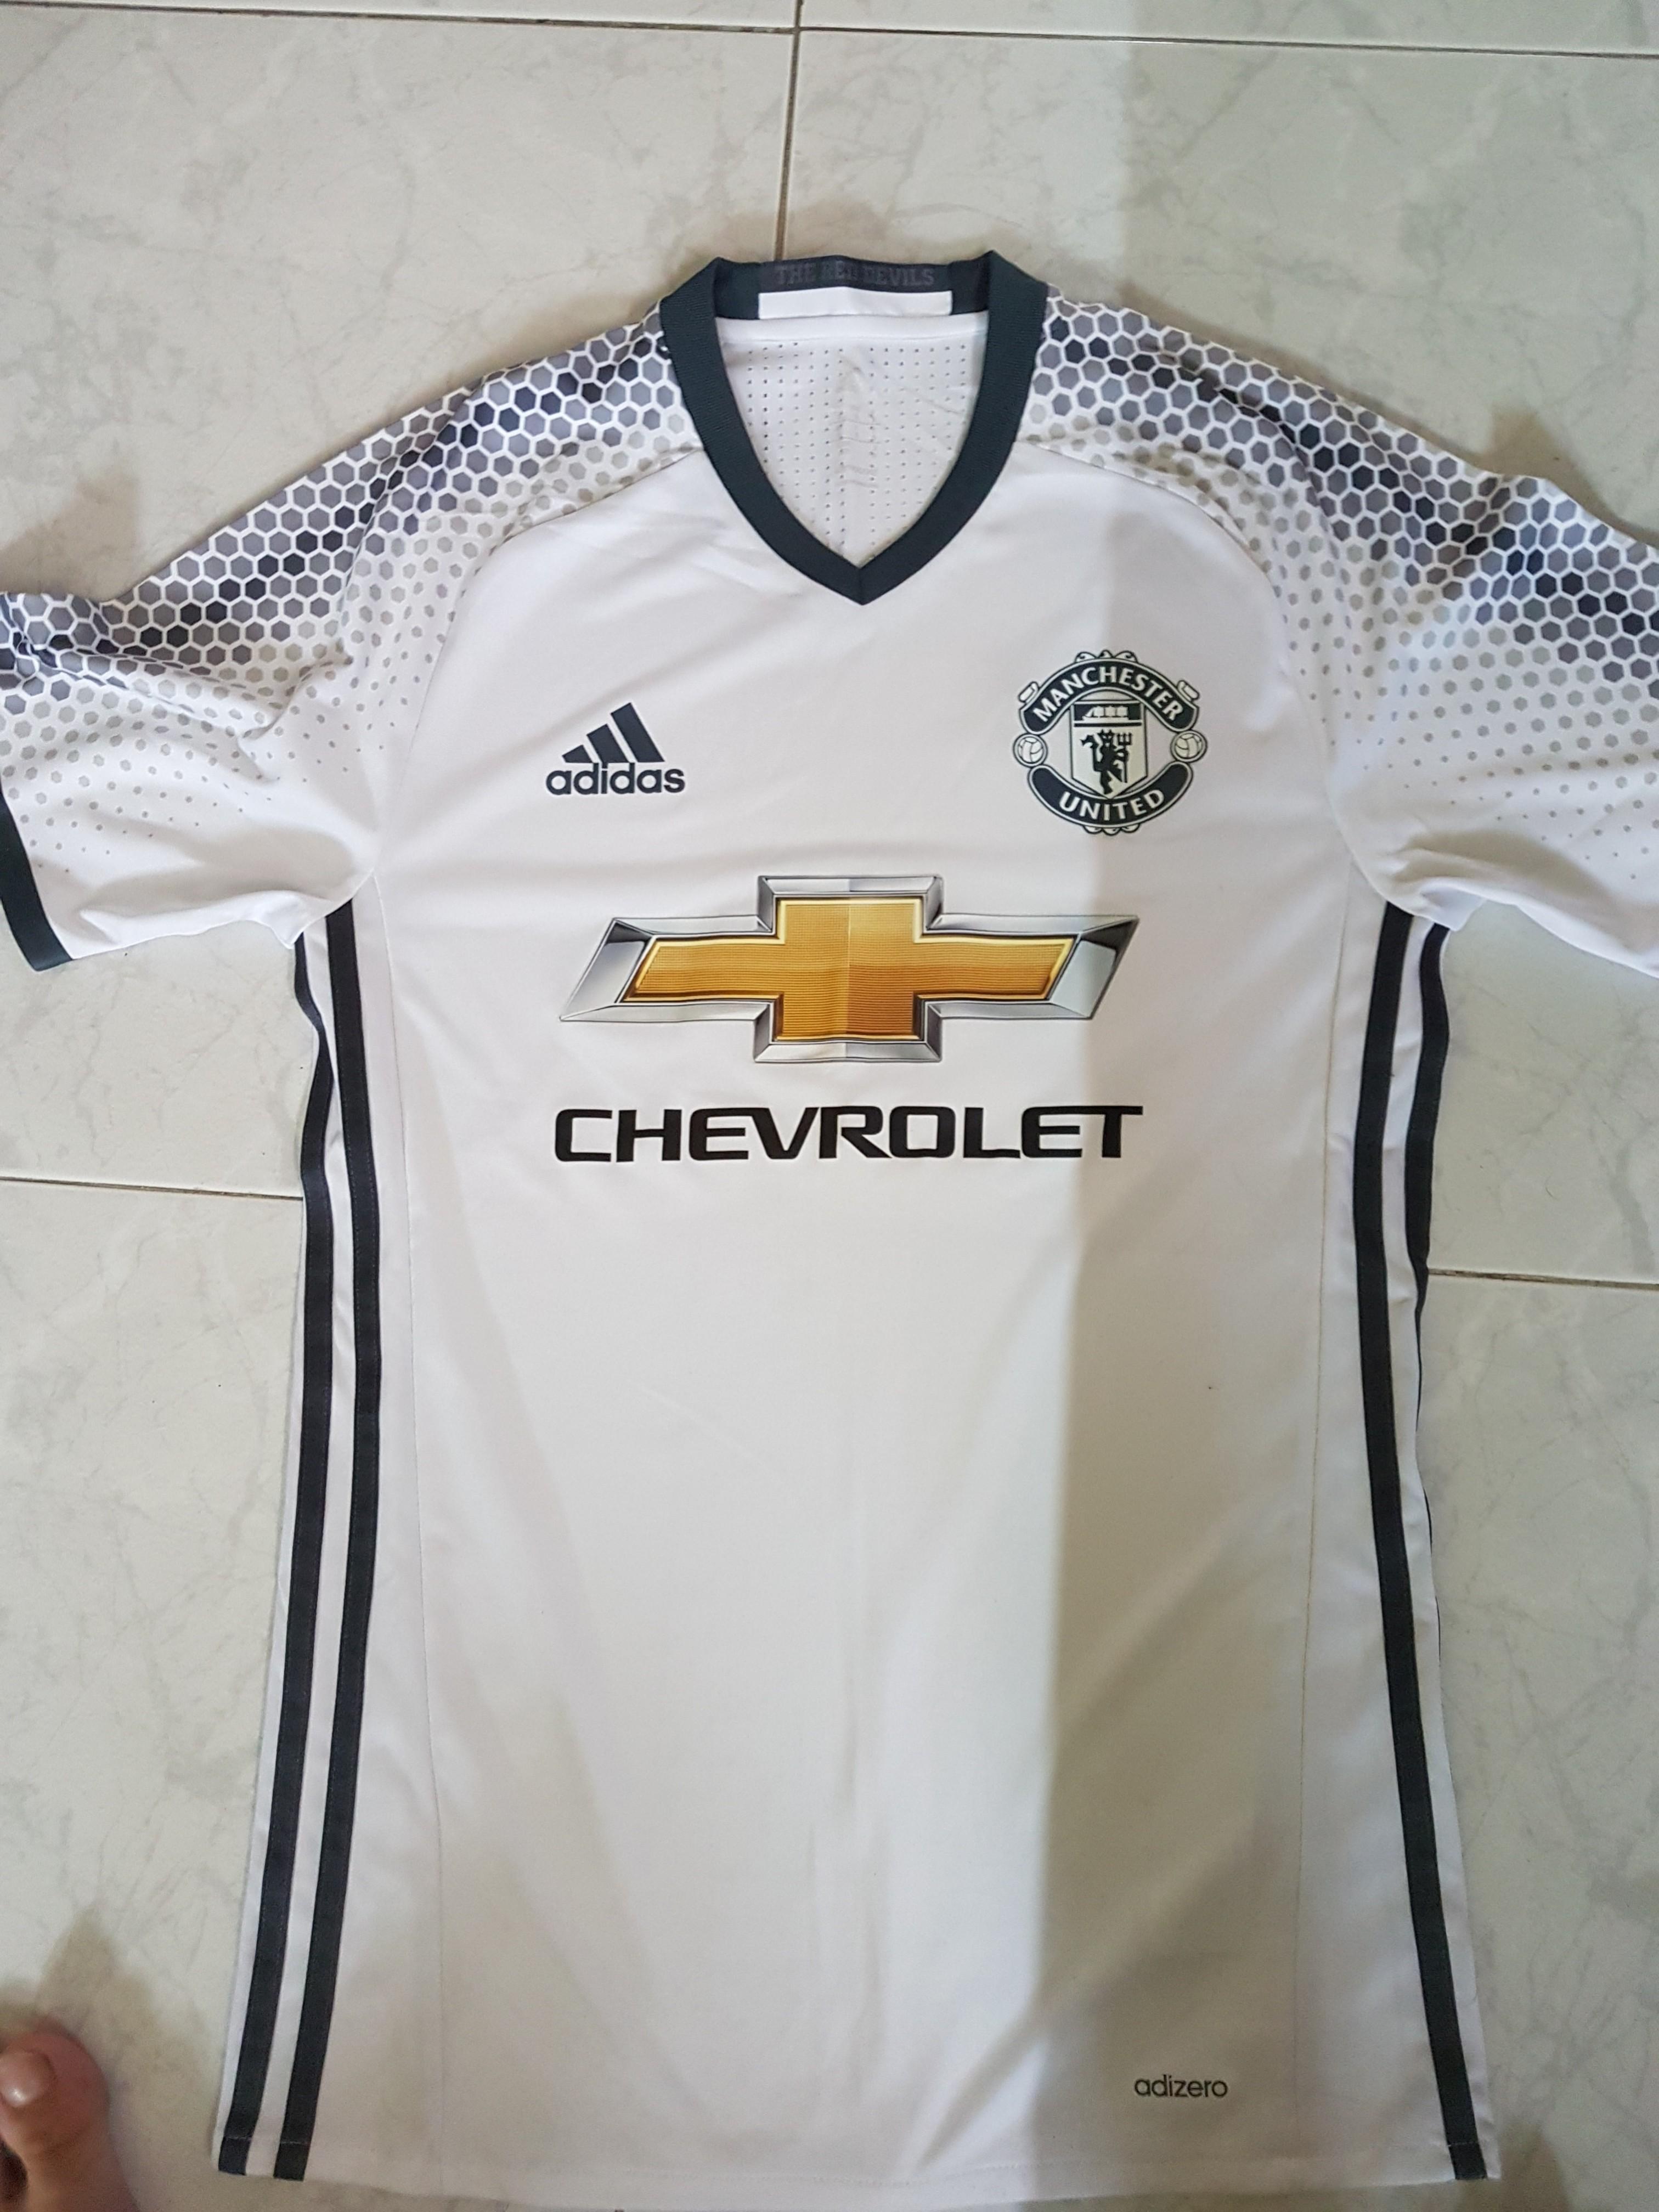 5cbeed4e618 Adidas Manchester United 16 17 Away Kit Adizero